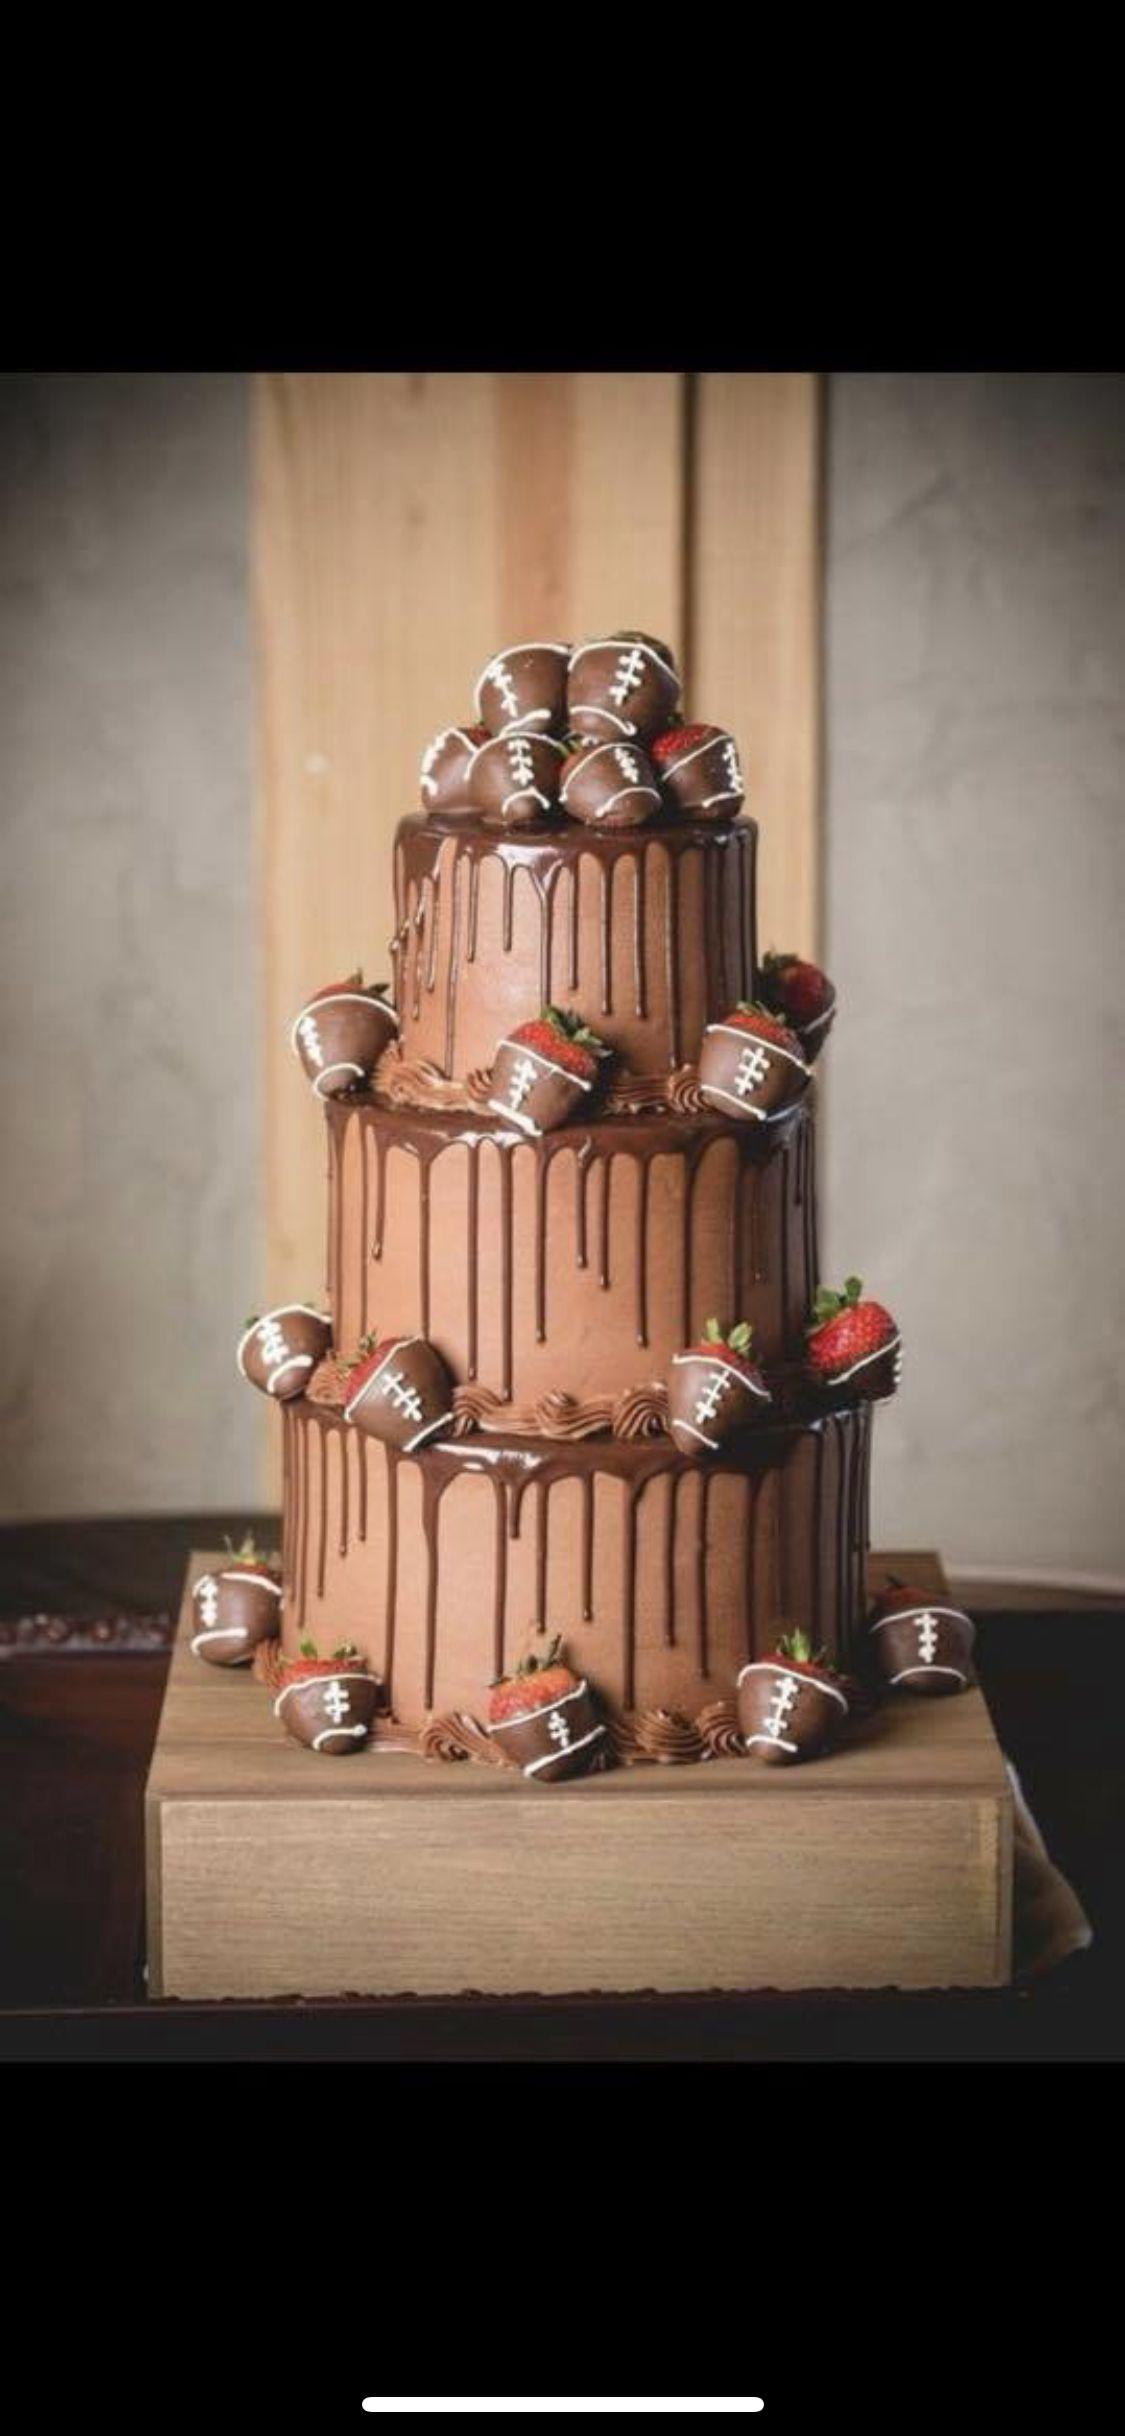 Chocolate Grooms Cake Ideas Ganache Drizzle Grooms Cake Football